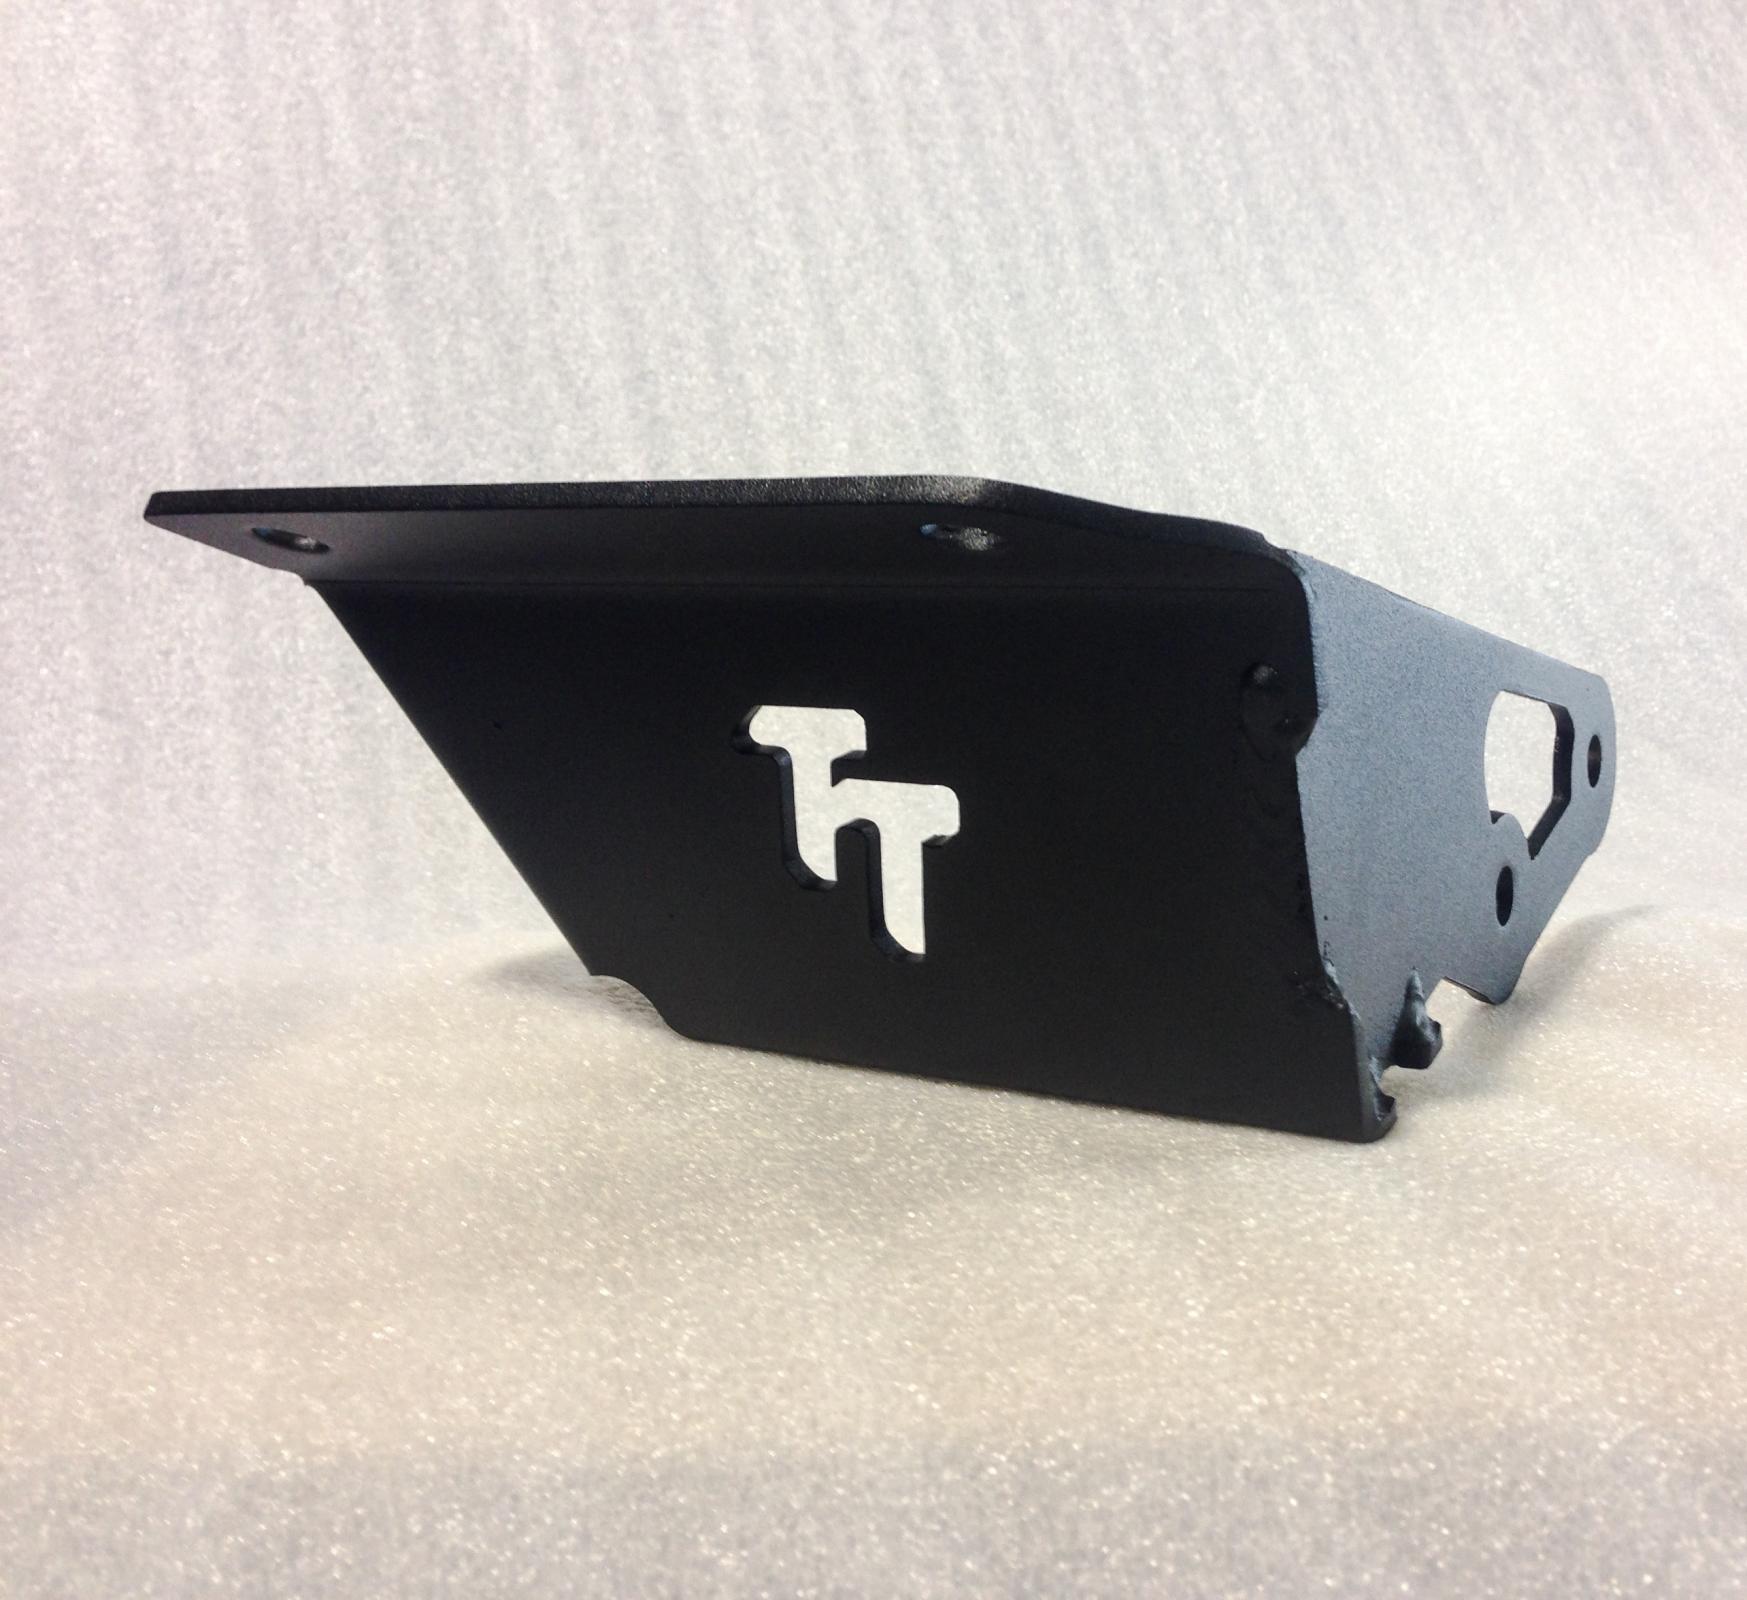 TNT Customs TSBS - TJ Steering Box Skid Plate 97-06 Wrangler TJ/LJ